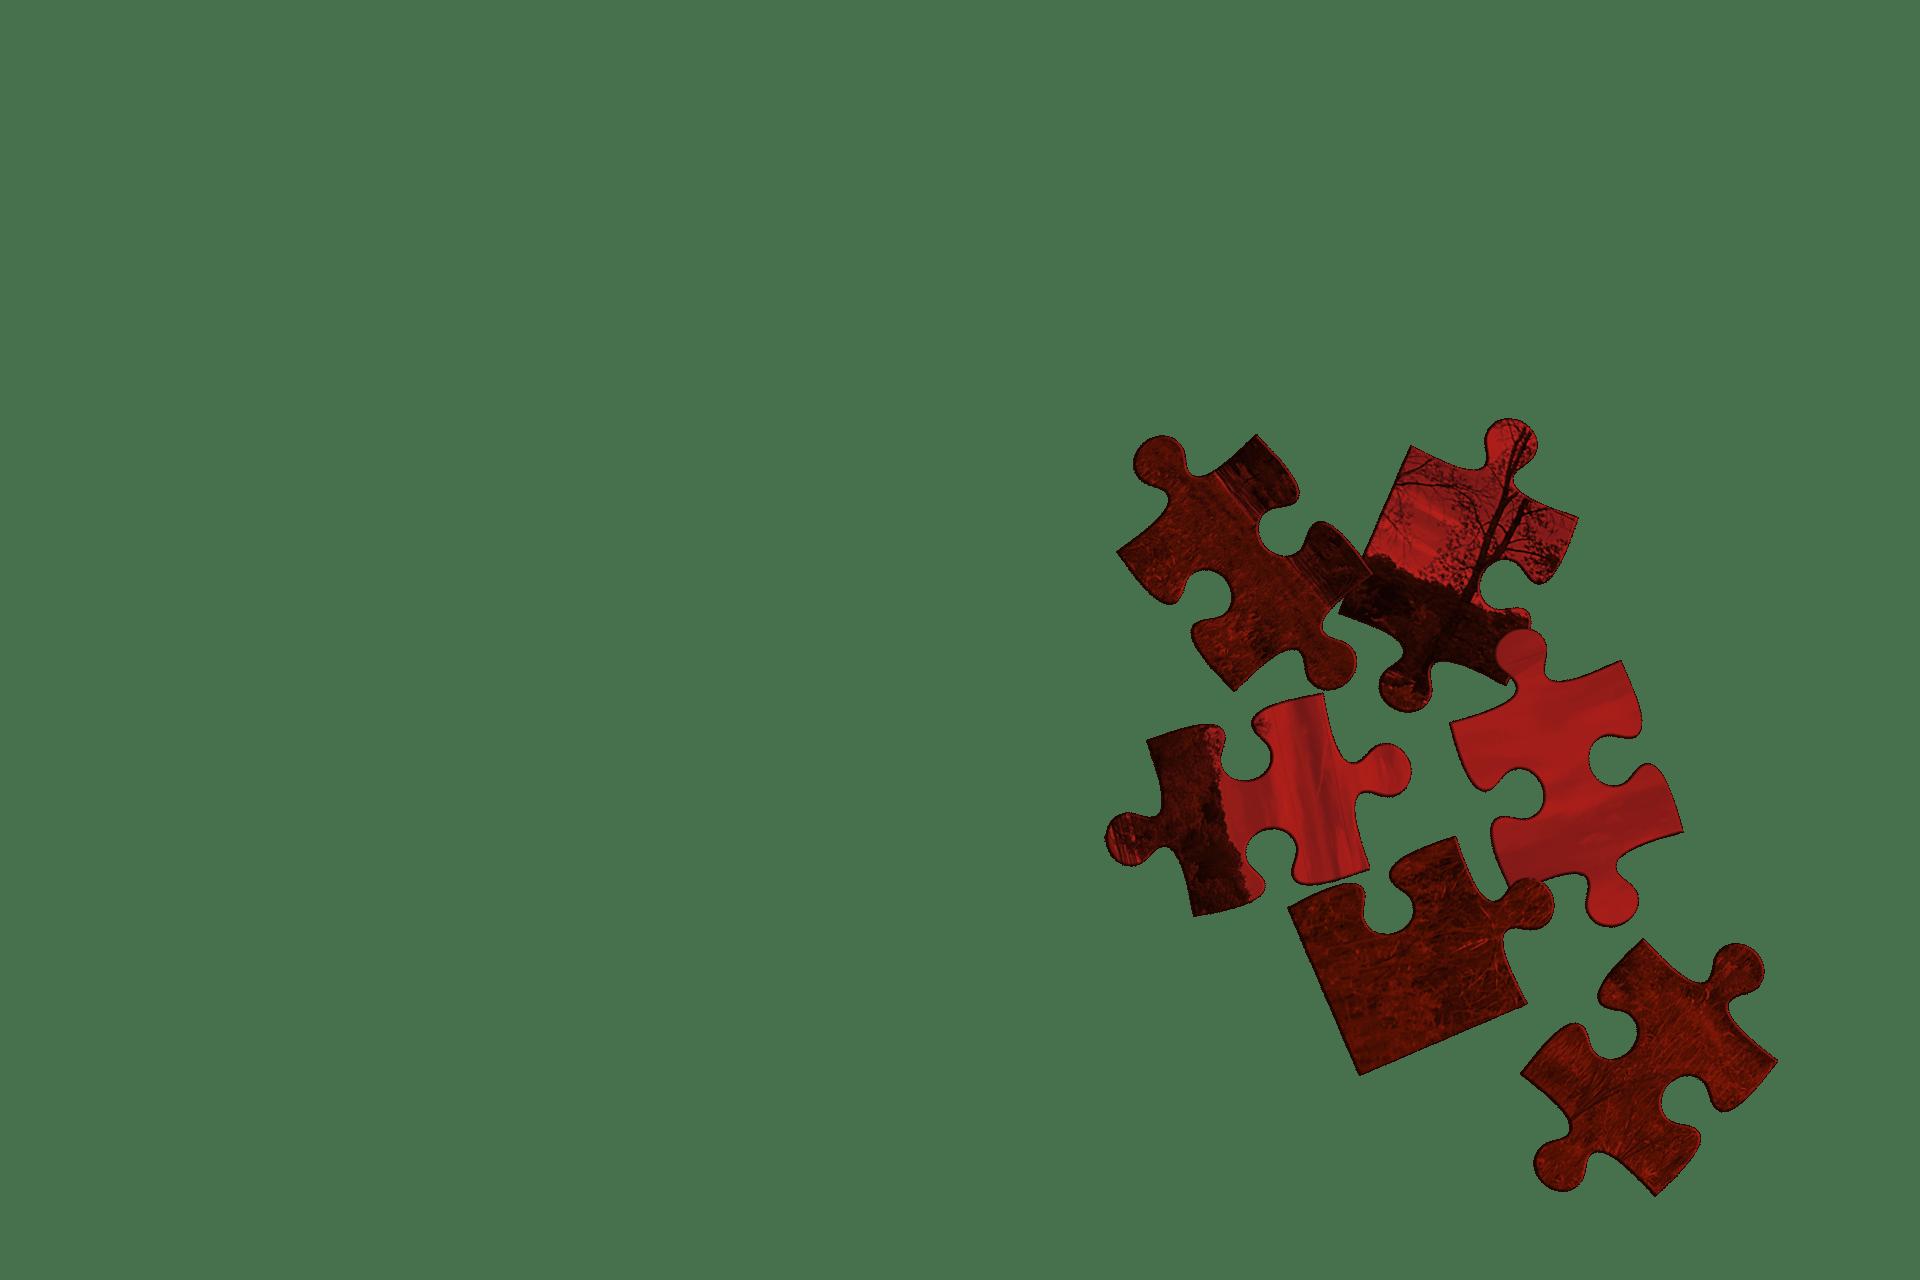 entrep puzzle image